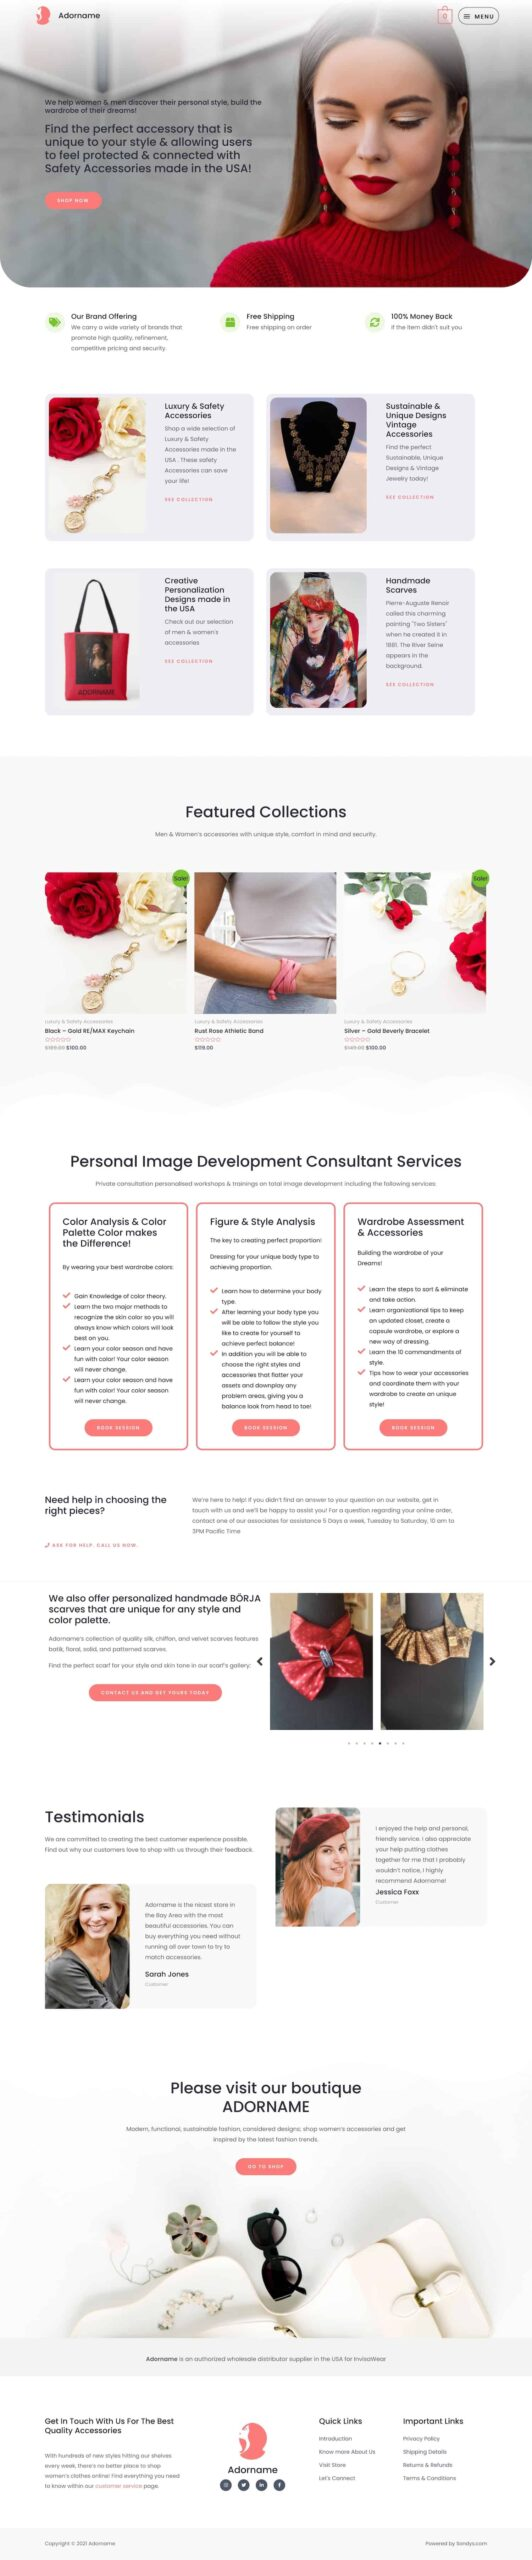 sondys online marketing webdesign web development houston adorname.com